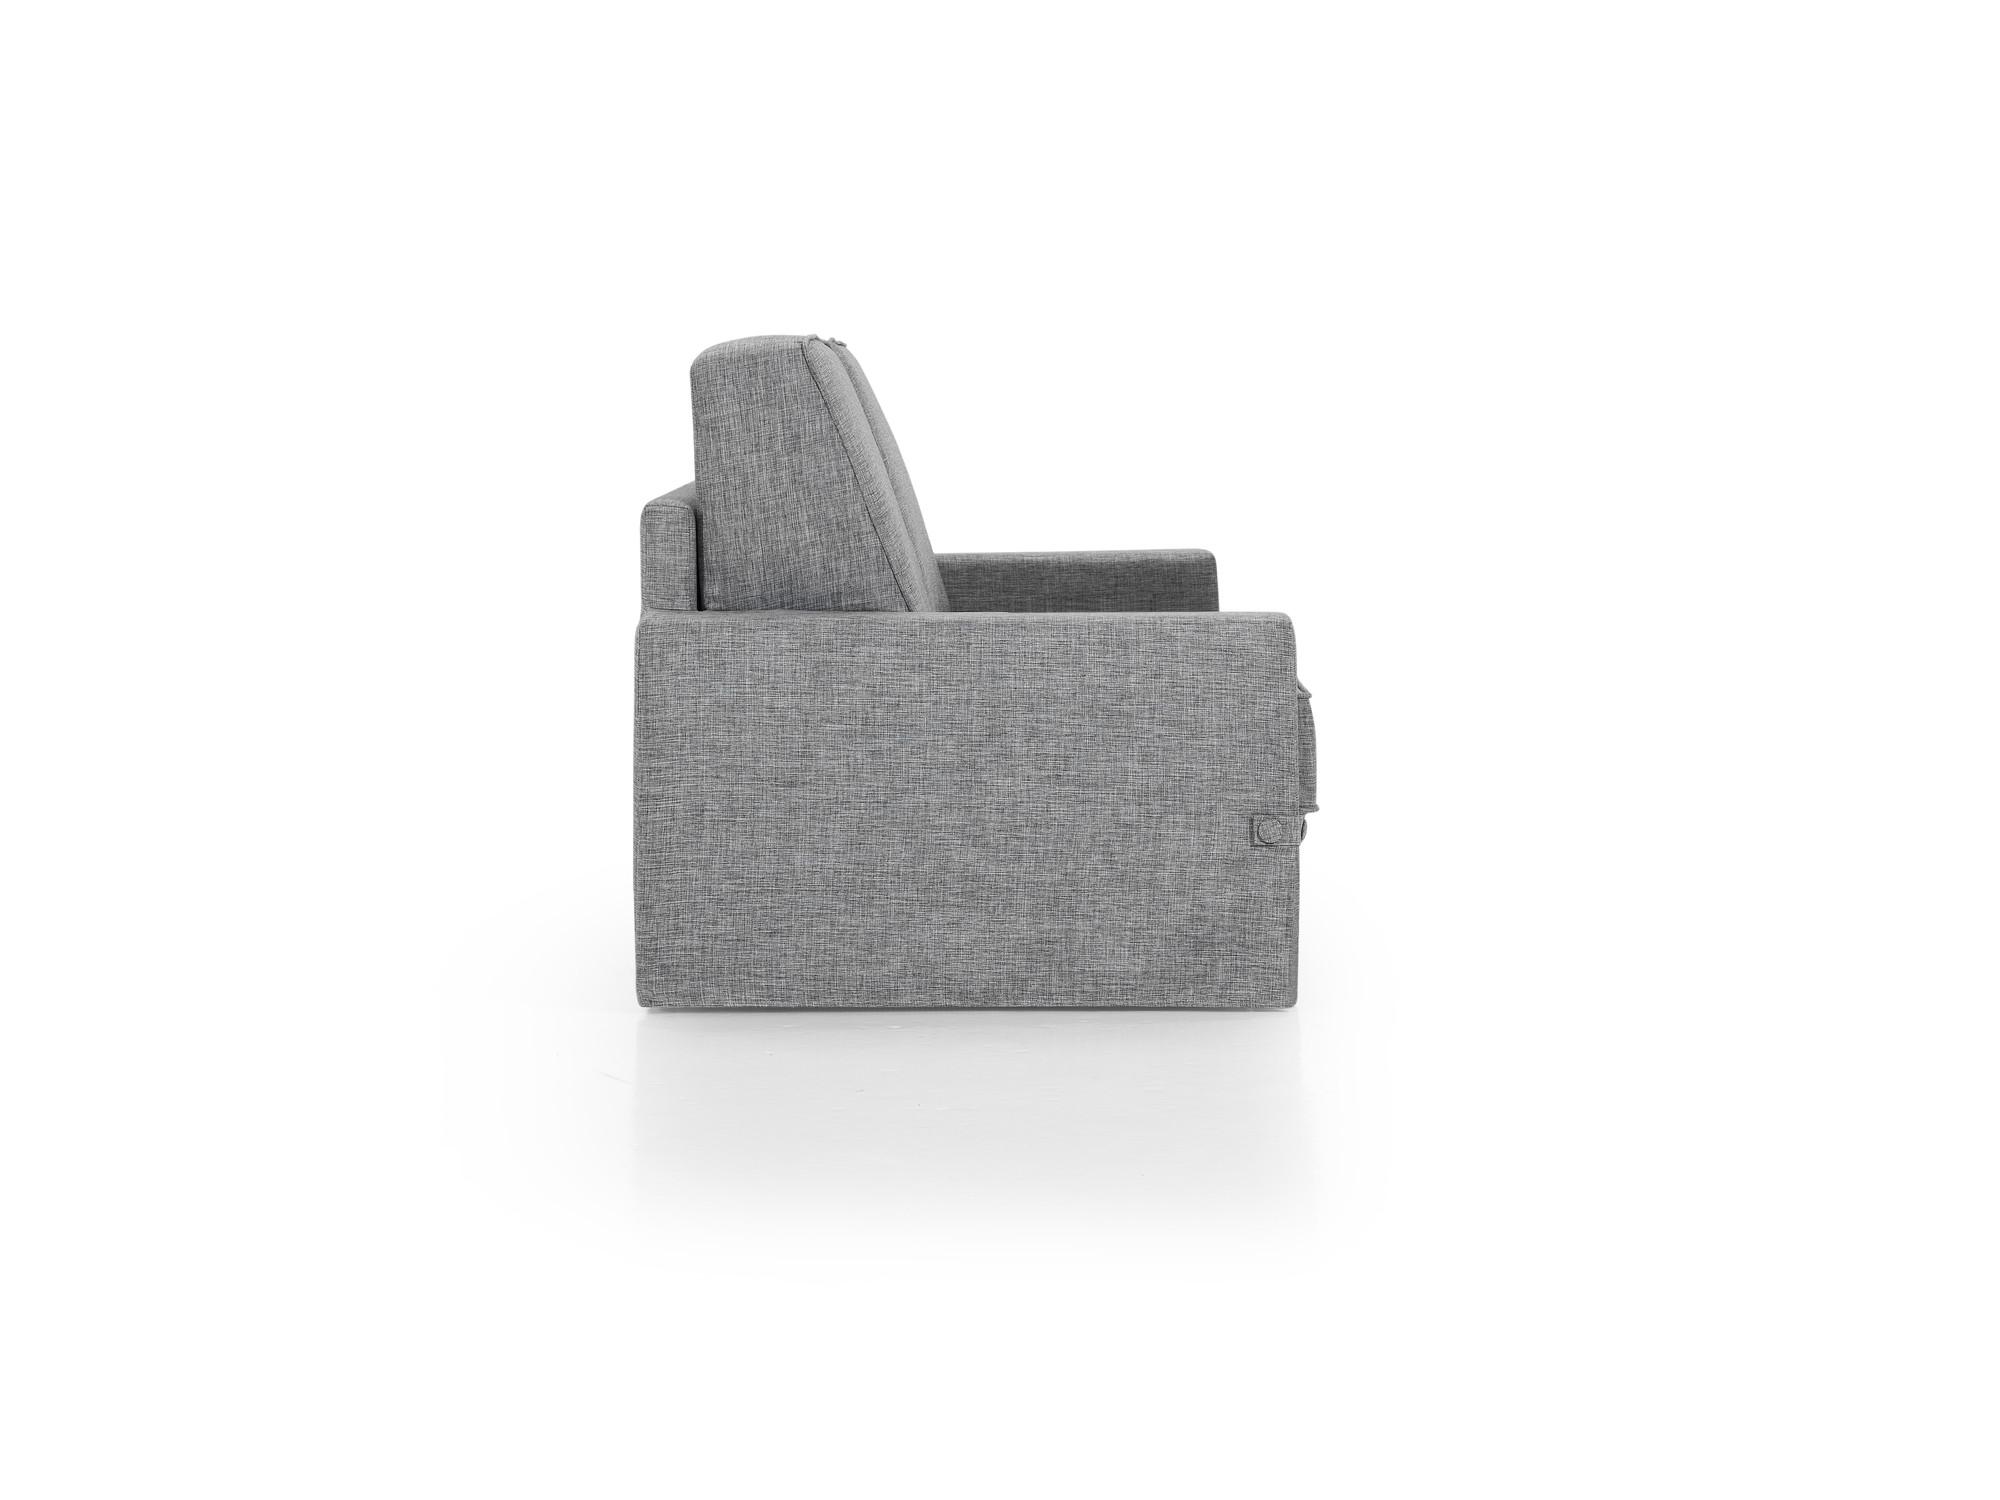 Comprar sofas cama baratos online la mesa de centro for Sofa blanco barato